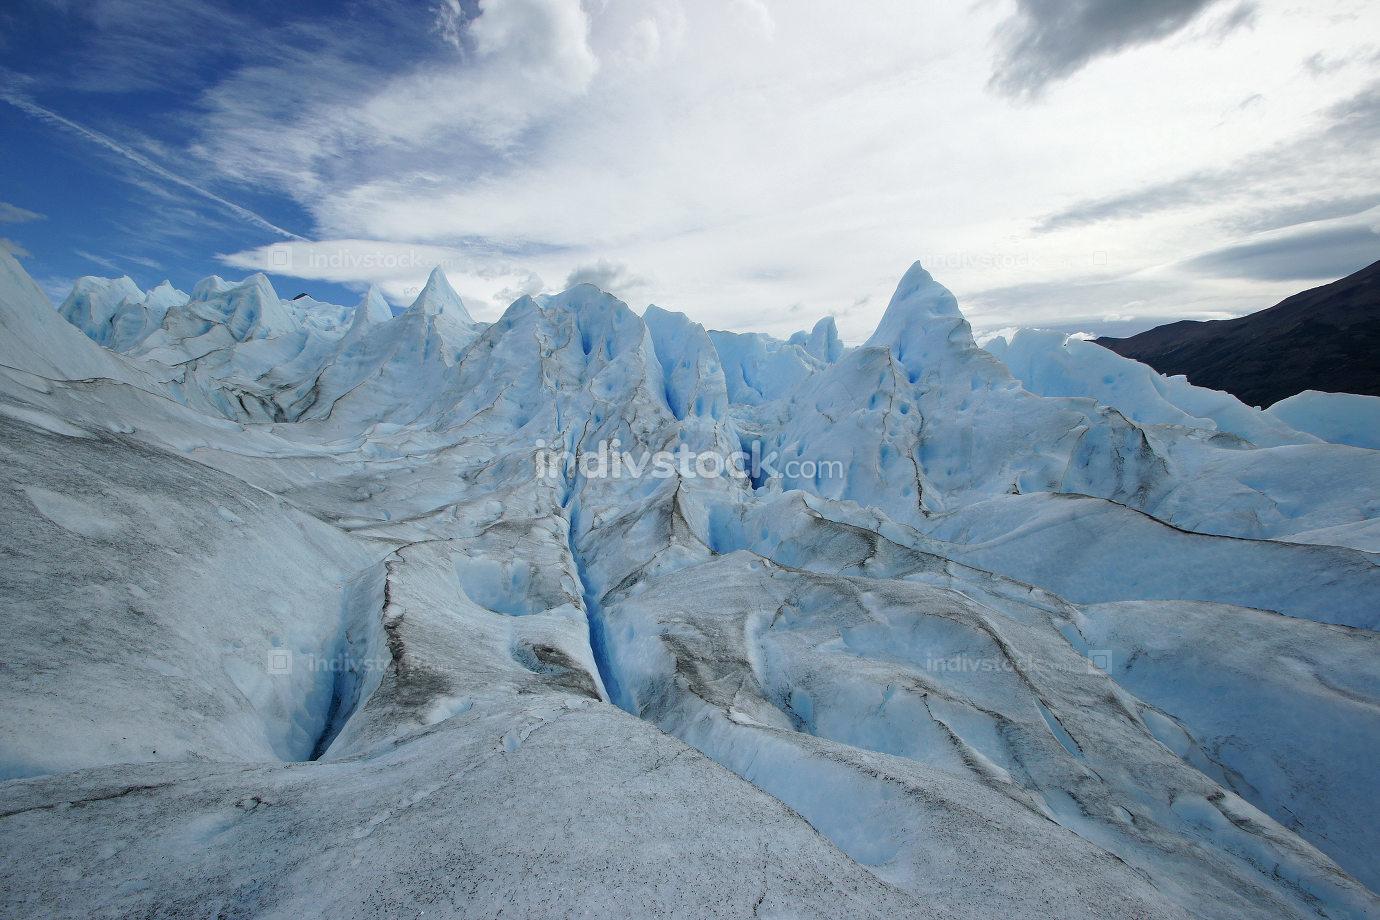 National Park Los Glaciares, Patagonia, Argentina